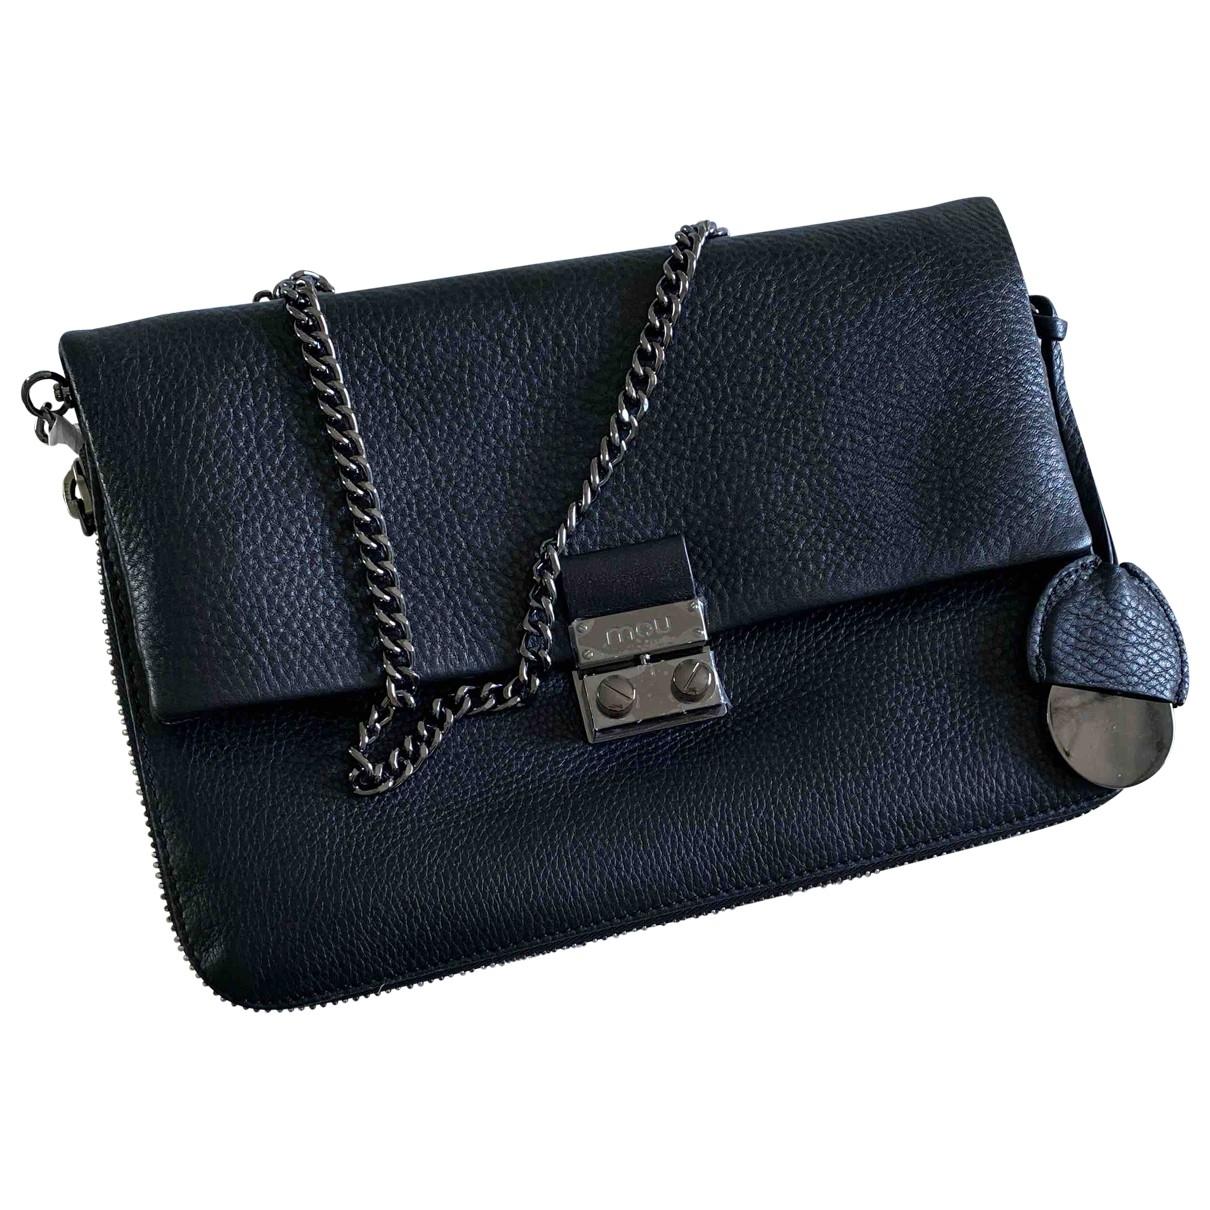 Mou \N Black Patent leather handbag for Women \N